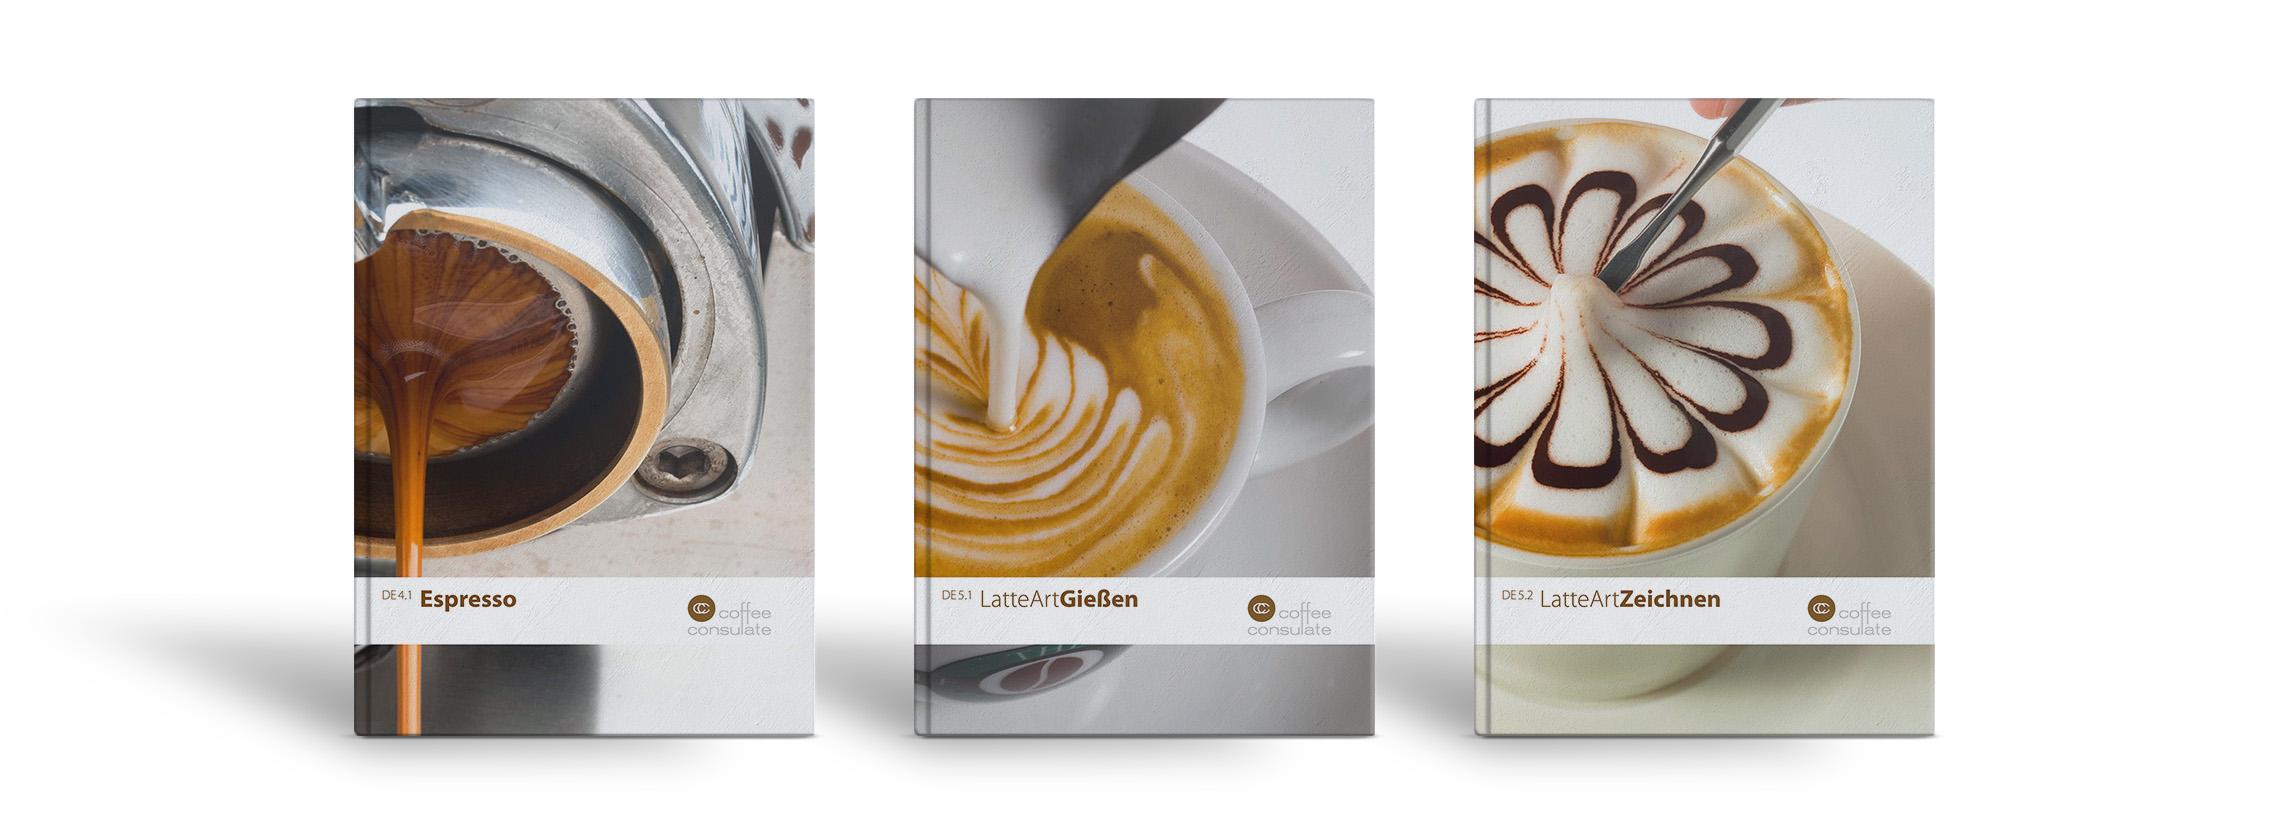 LatteArt Professionell